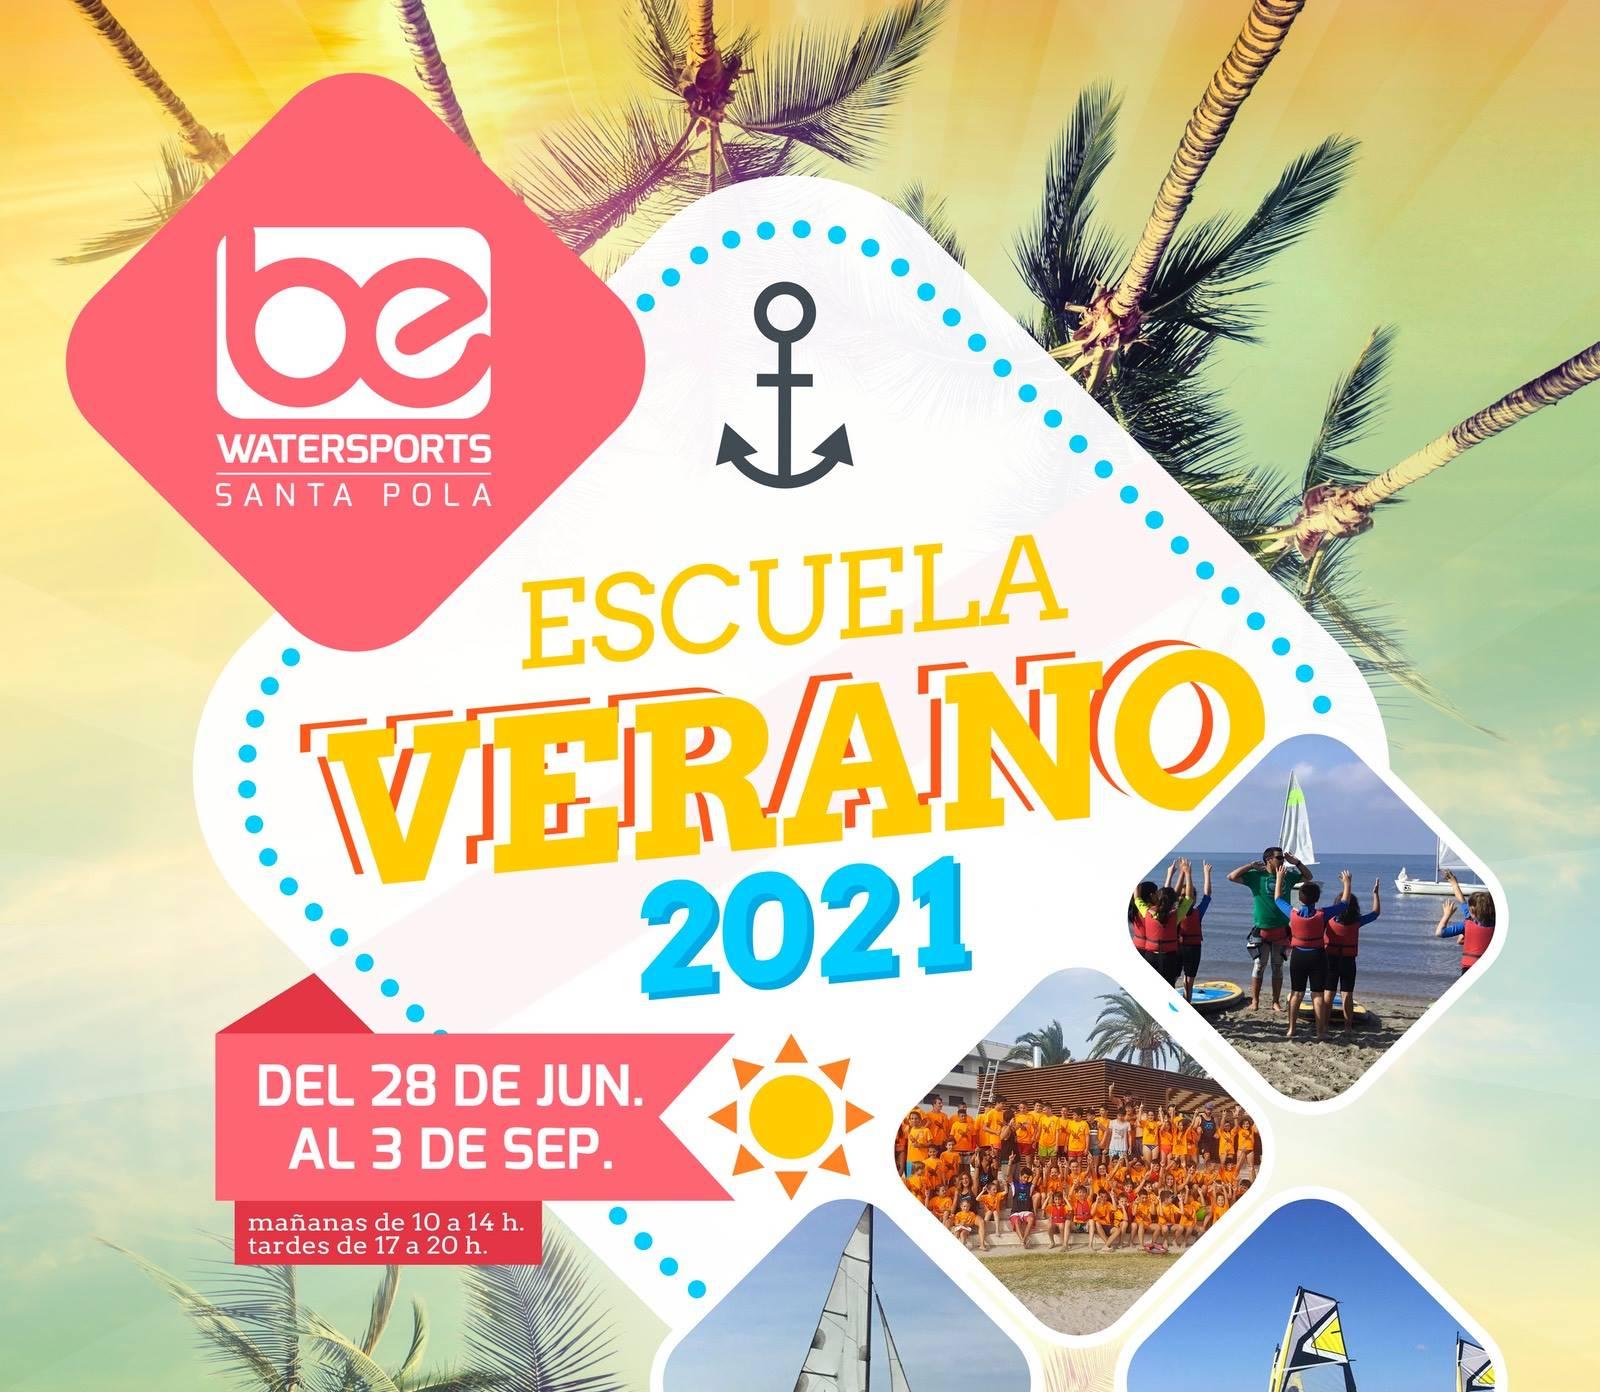 banner es cuela de verano be watersports 2021 kitesurf windsurf paddlesurf wingsurf wingfoil SURF.jpg